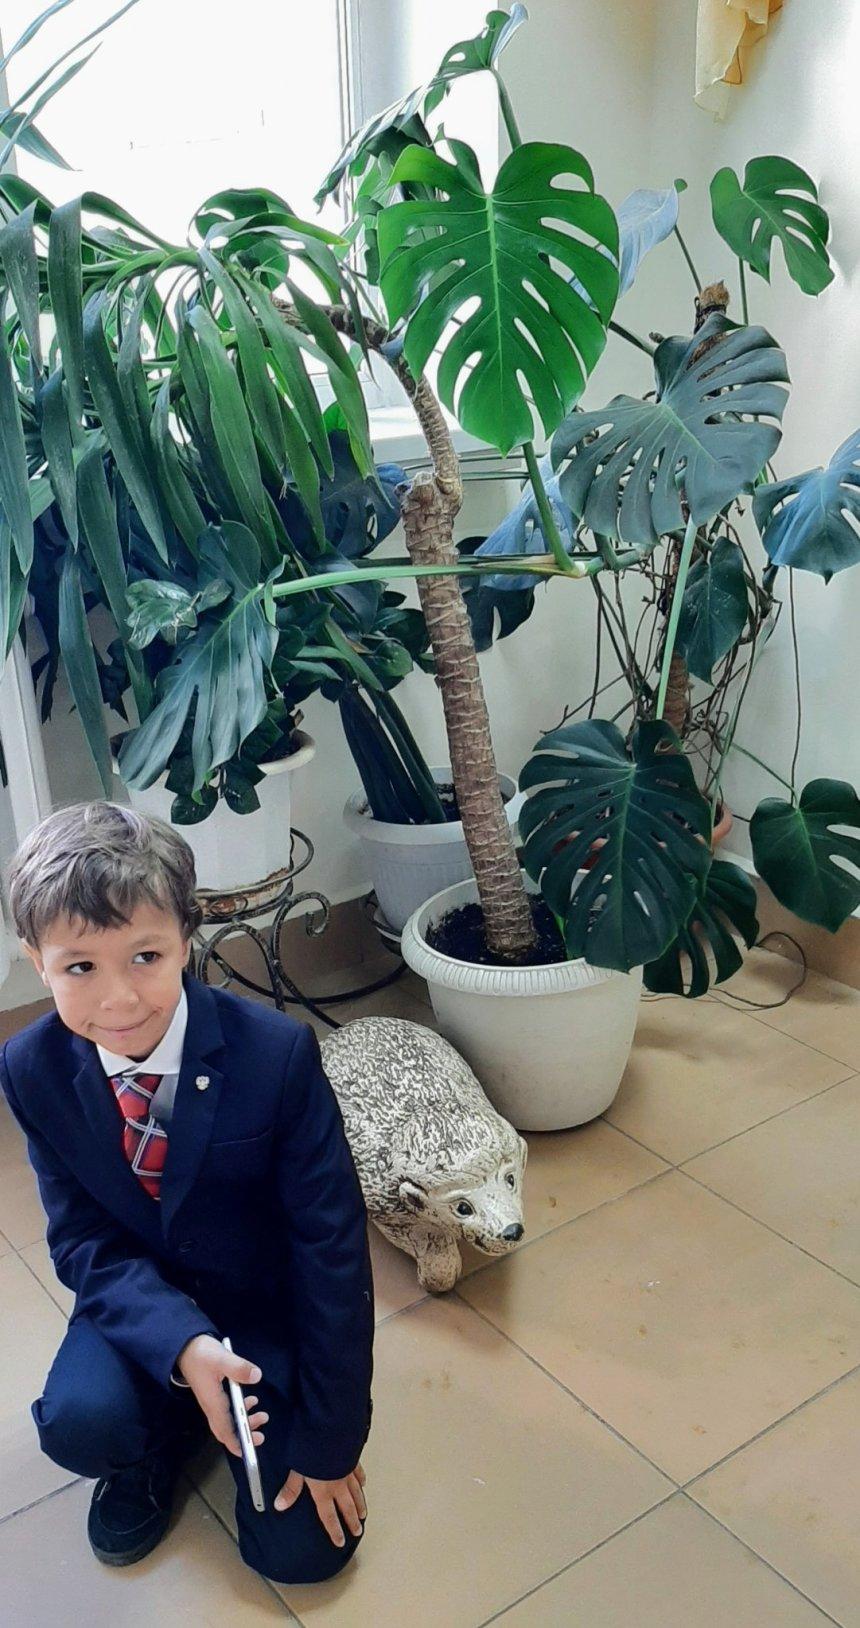 Отчёт по занятию Фотографируйте вместе с ребенком растения в Wachanga!